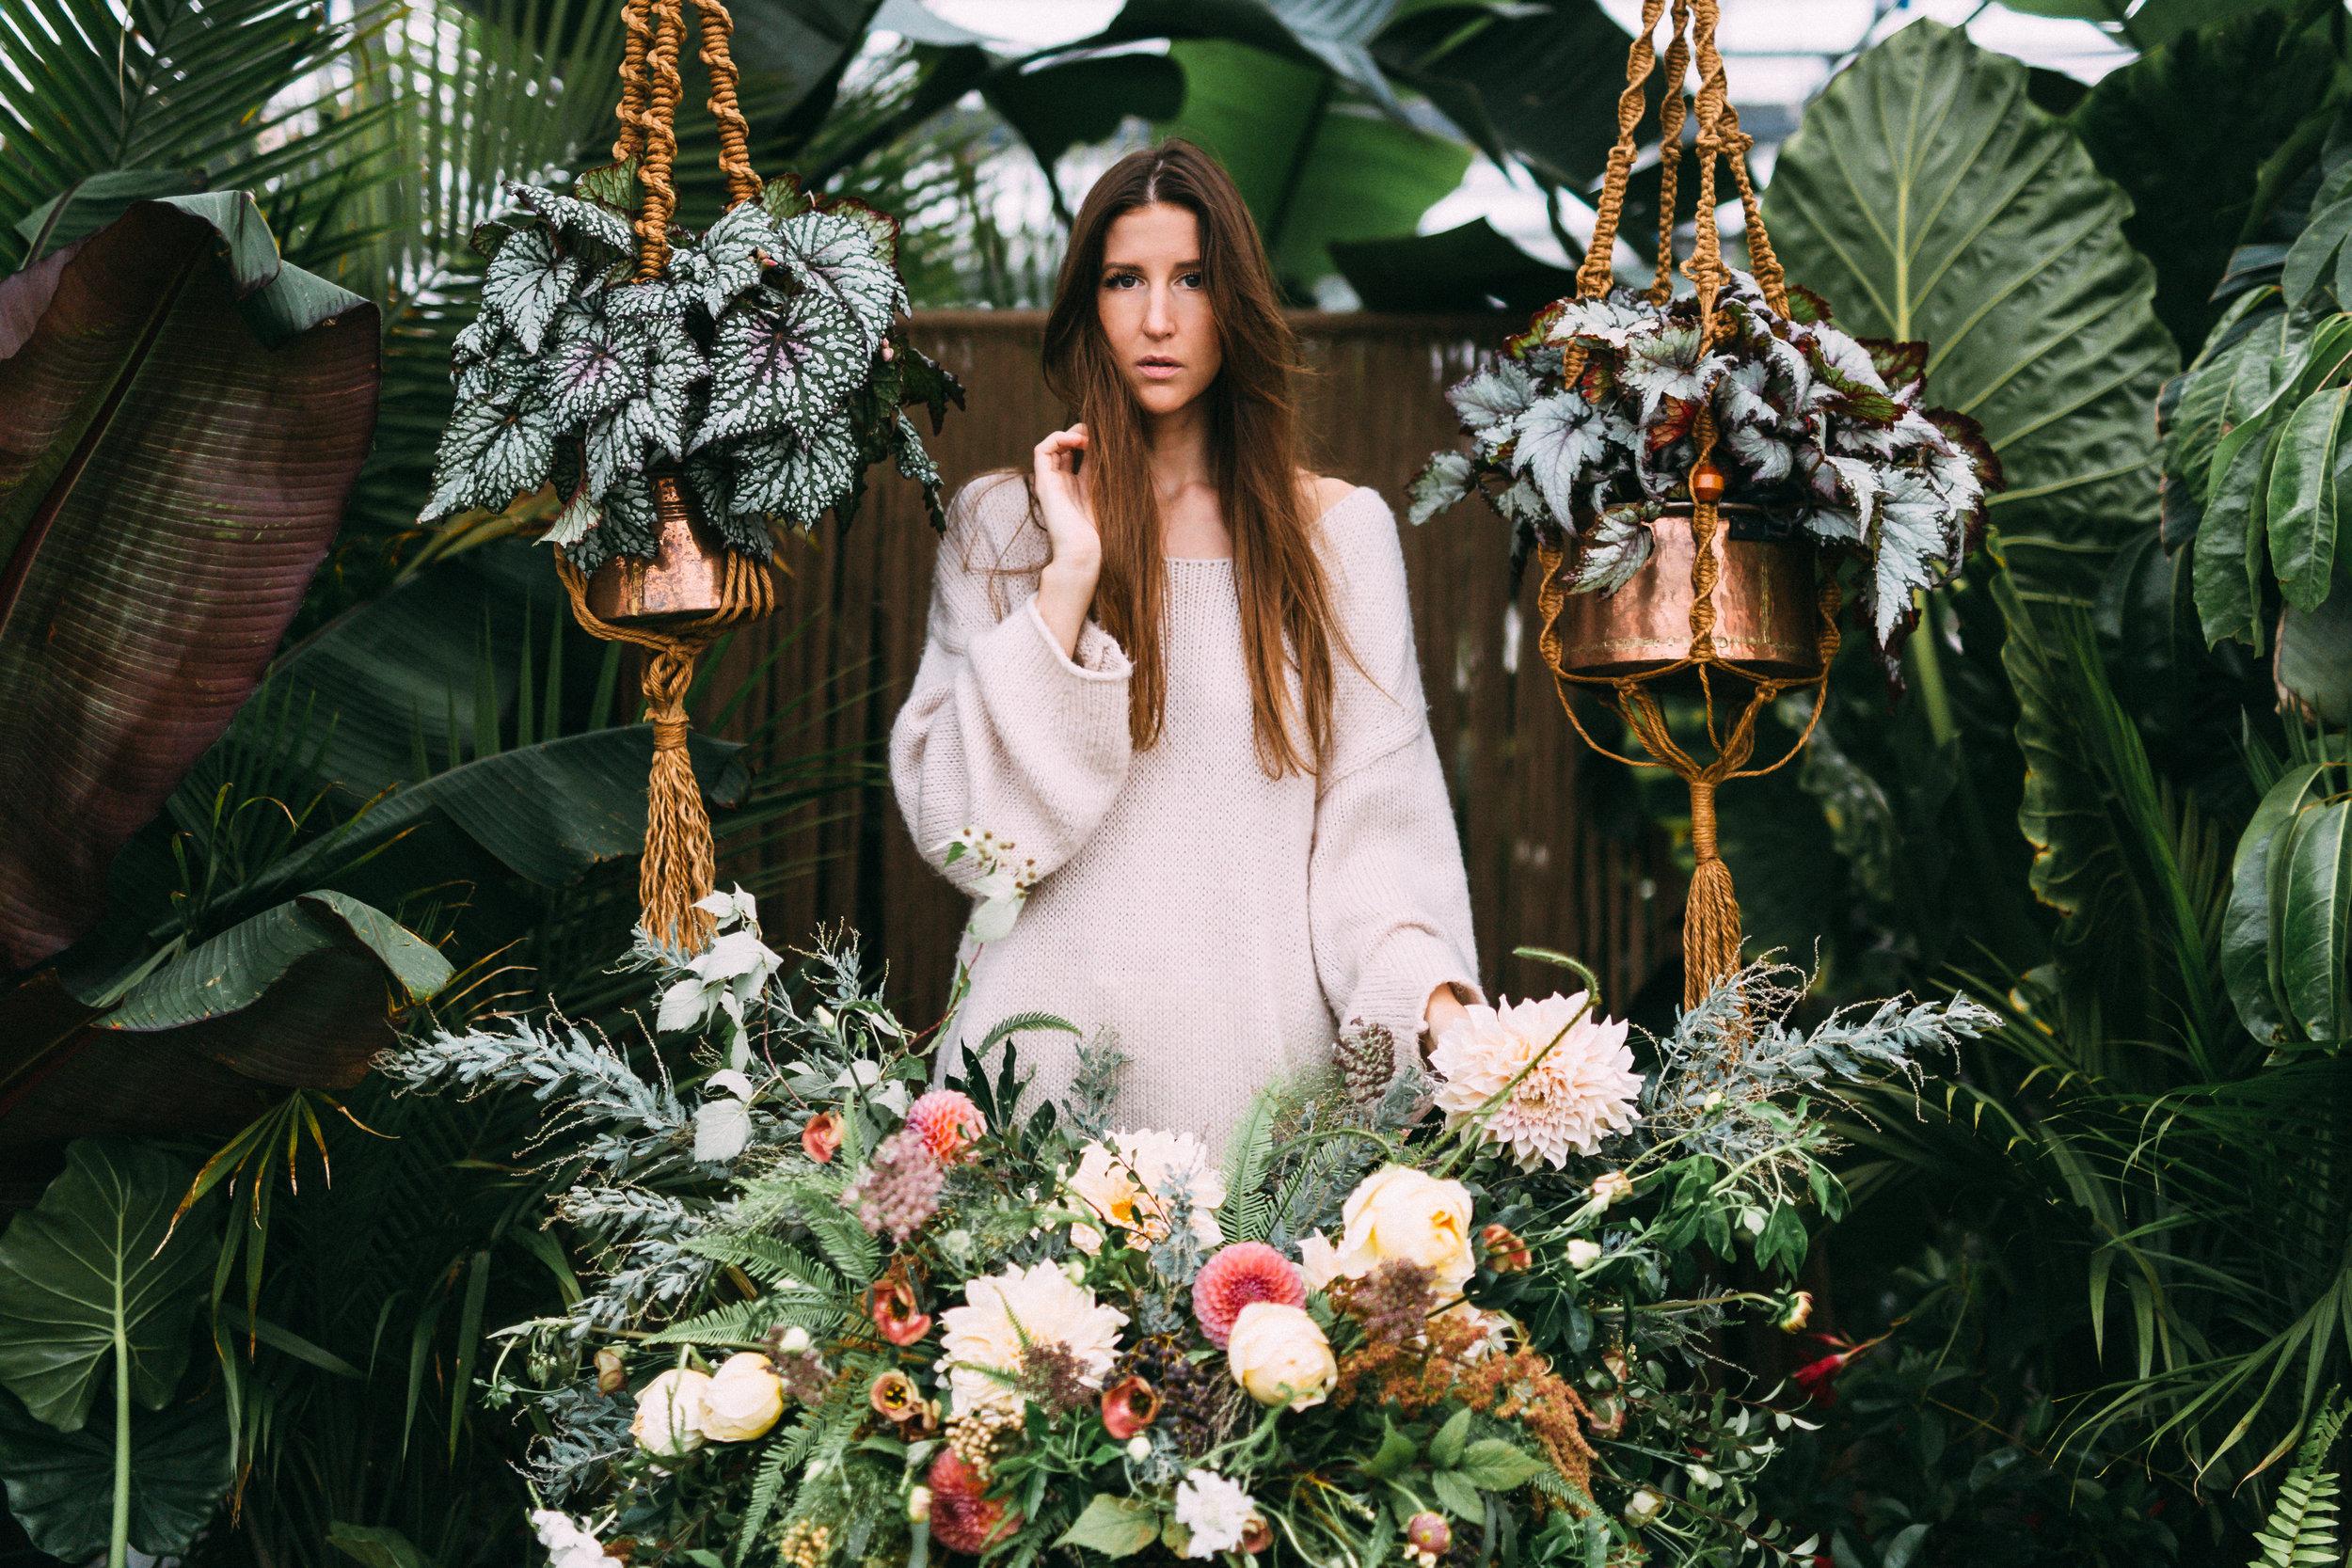 amanda cowley events niagara wedding planner free spirit styling bohemian style wicker planter